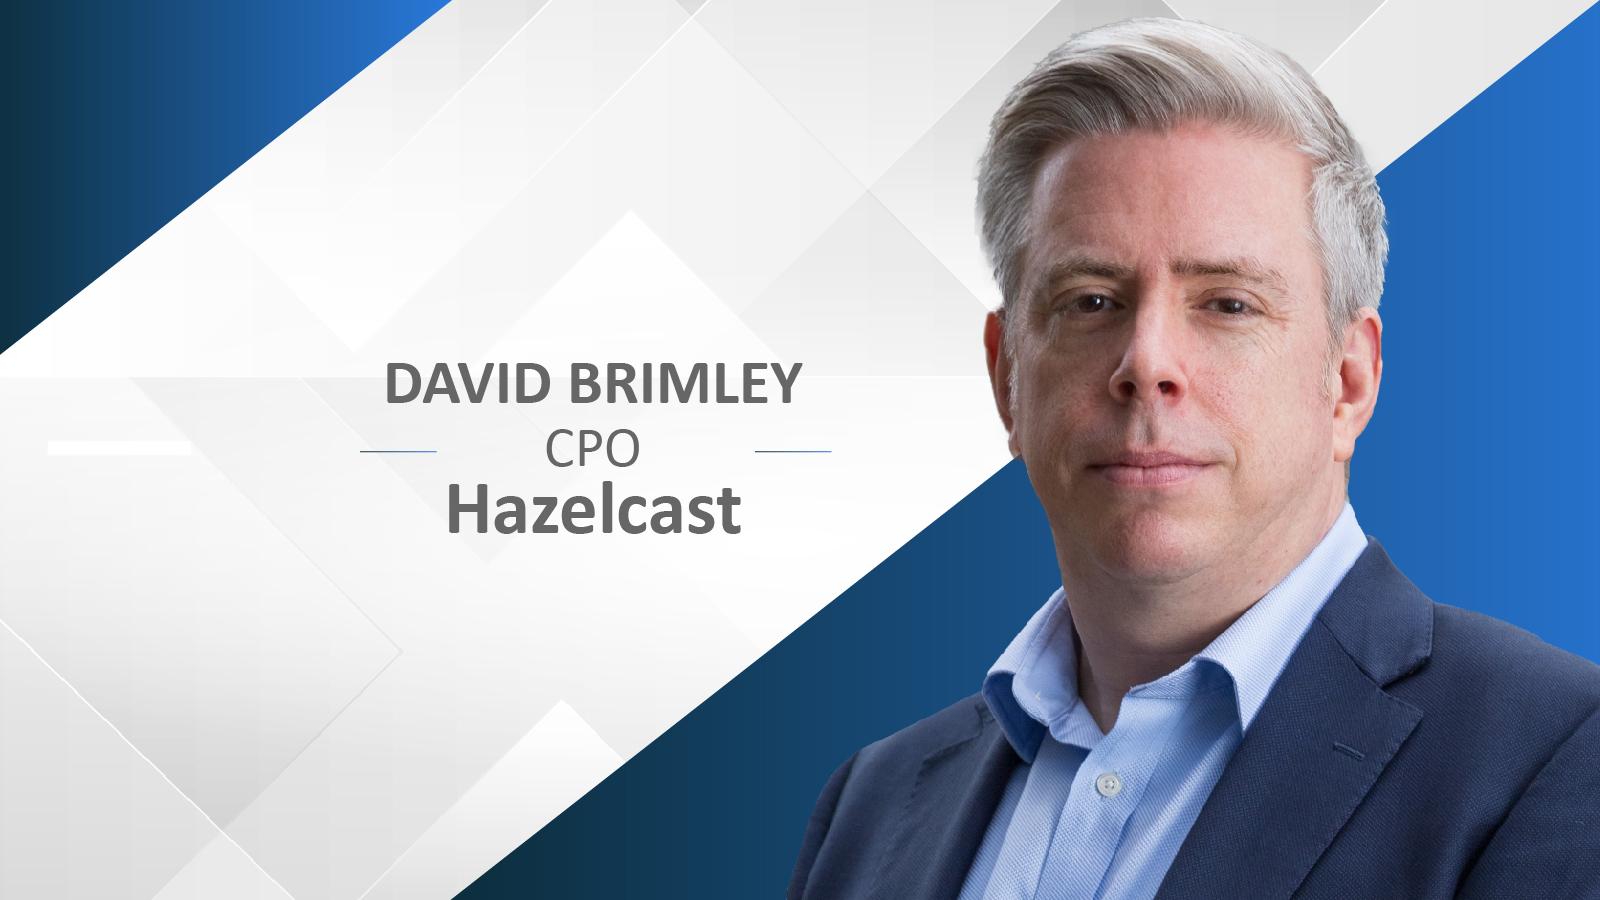 DAVID BRIMLEY on Digital Integration